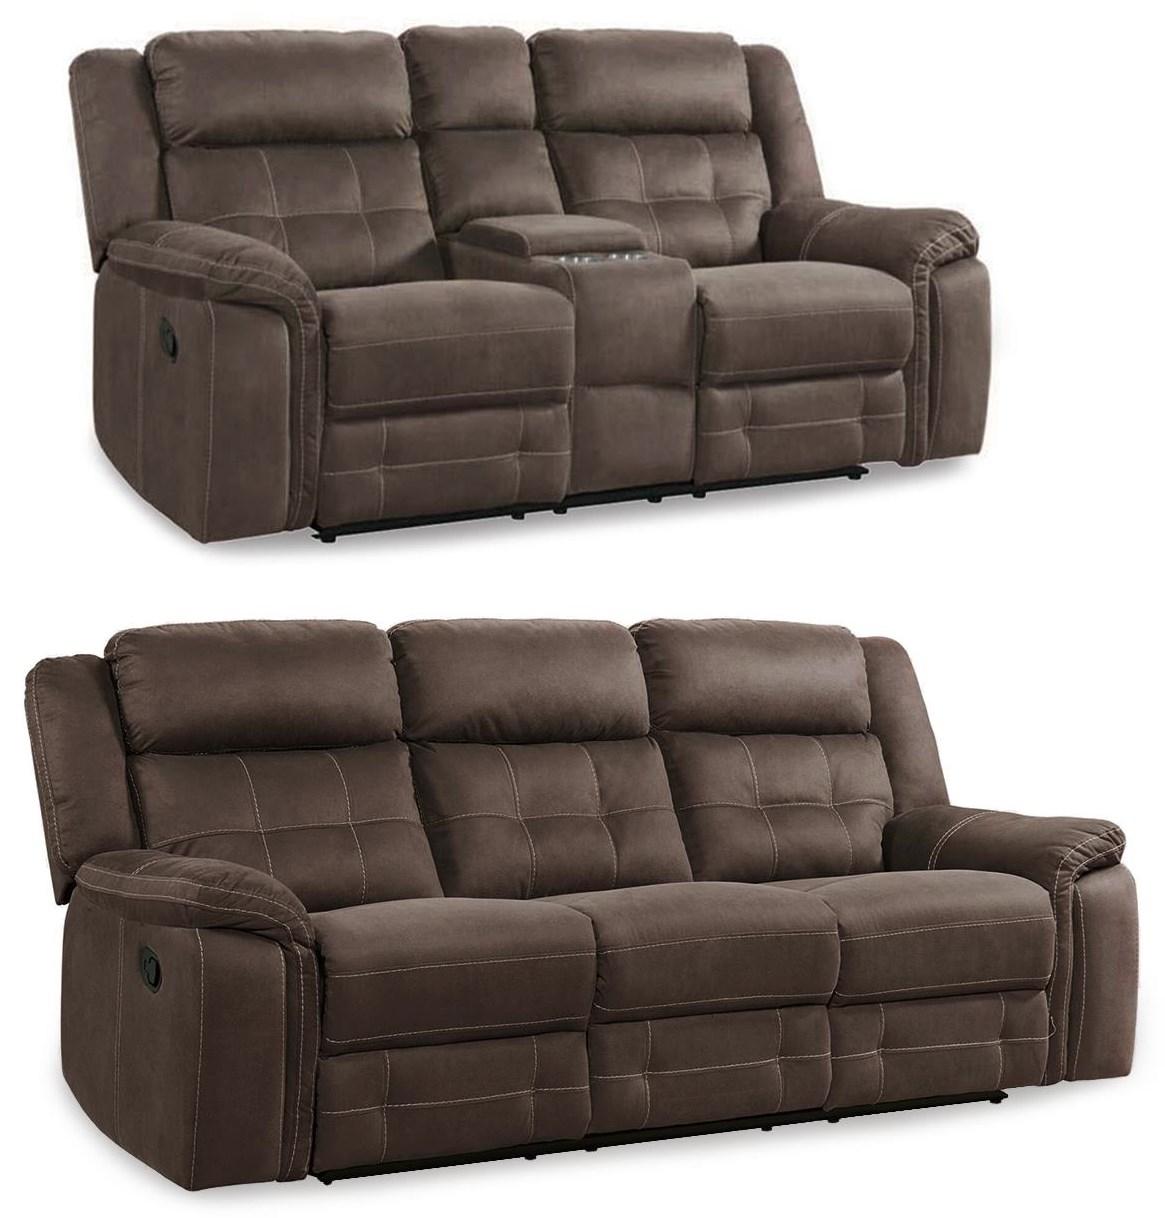 Keystone 2PC Reclining Sofa & Loveseat Set at Rotmans